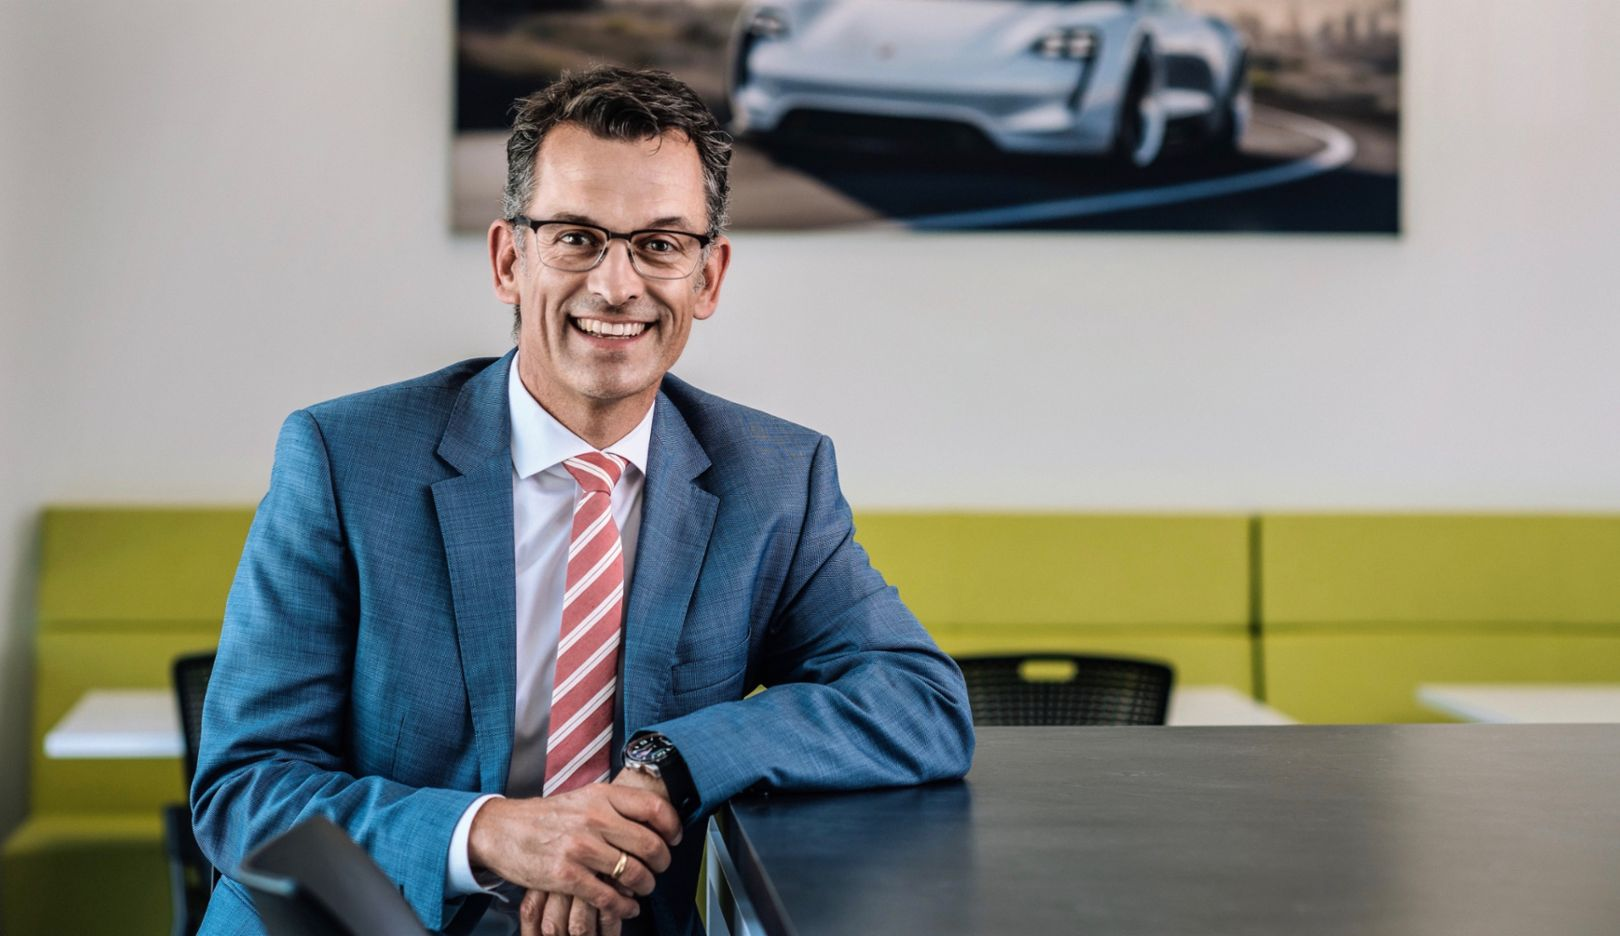 Alexander Pollich, 2018, Porsche AG